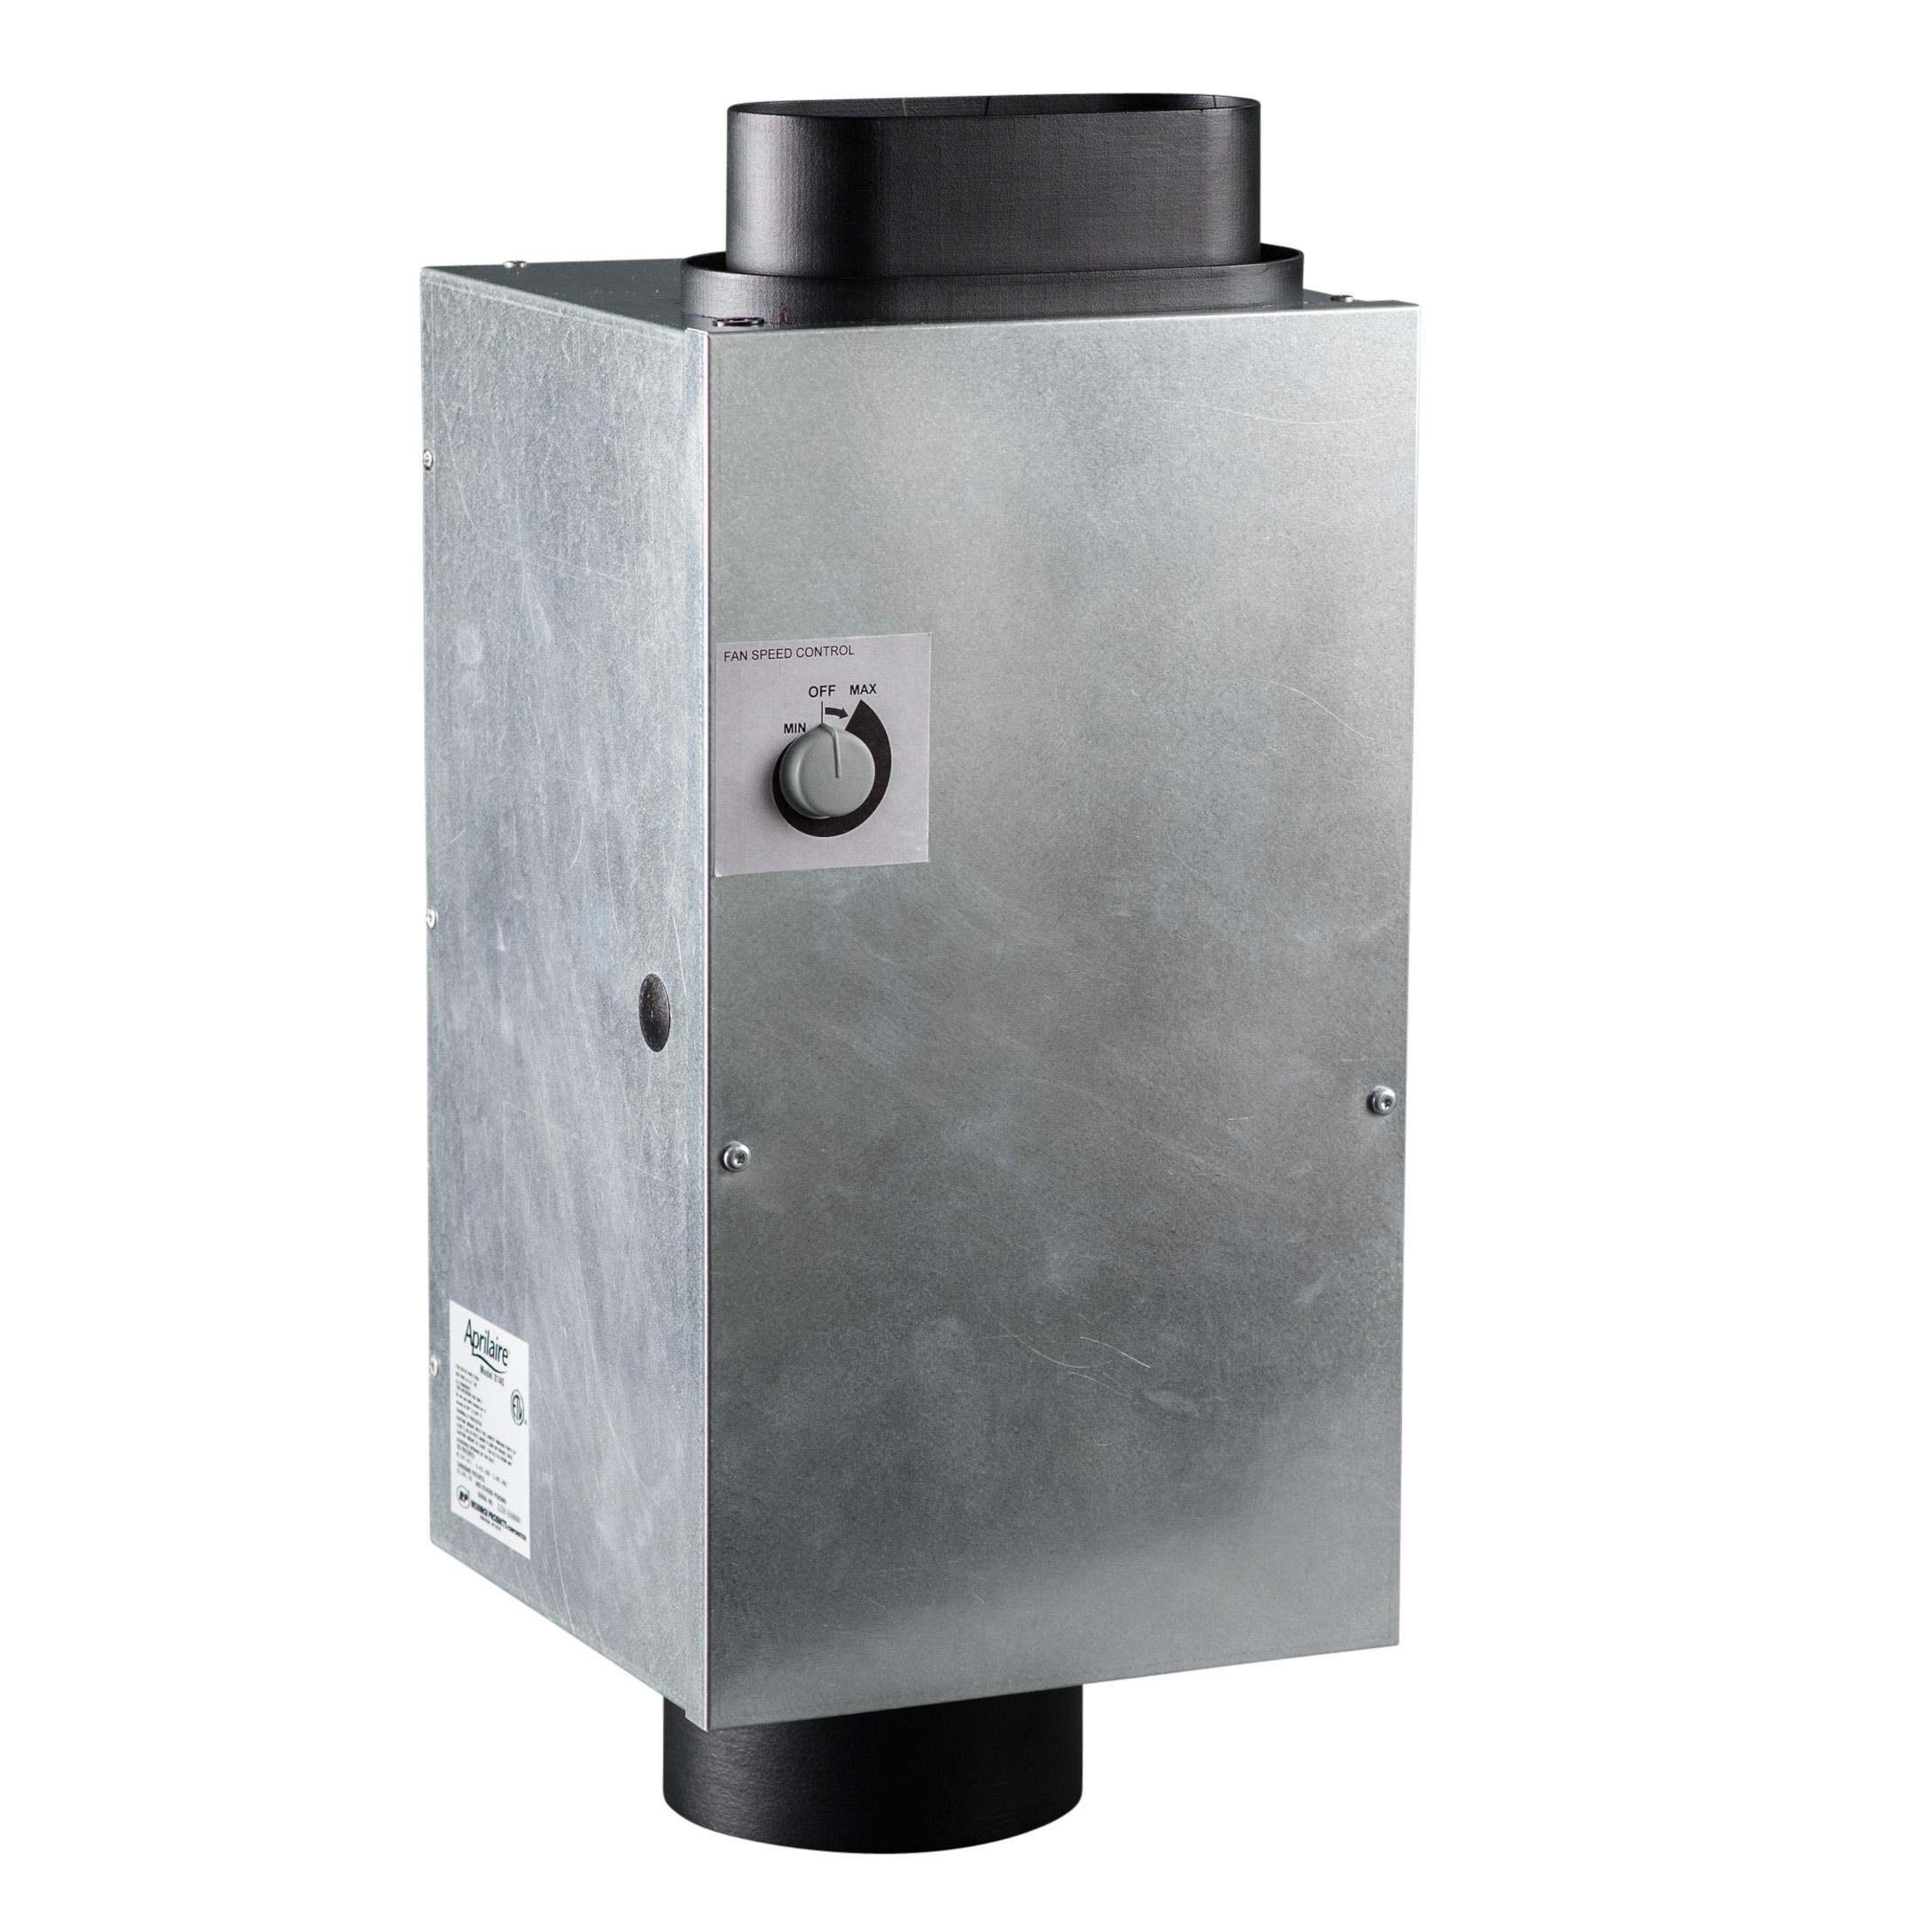 aprilaire-8144NC-ventilation-right-facing-photo